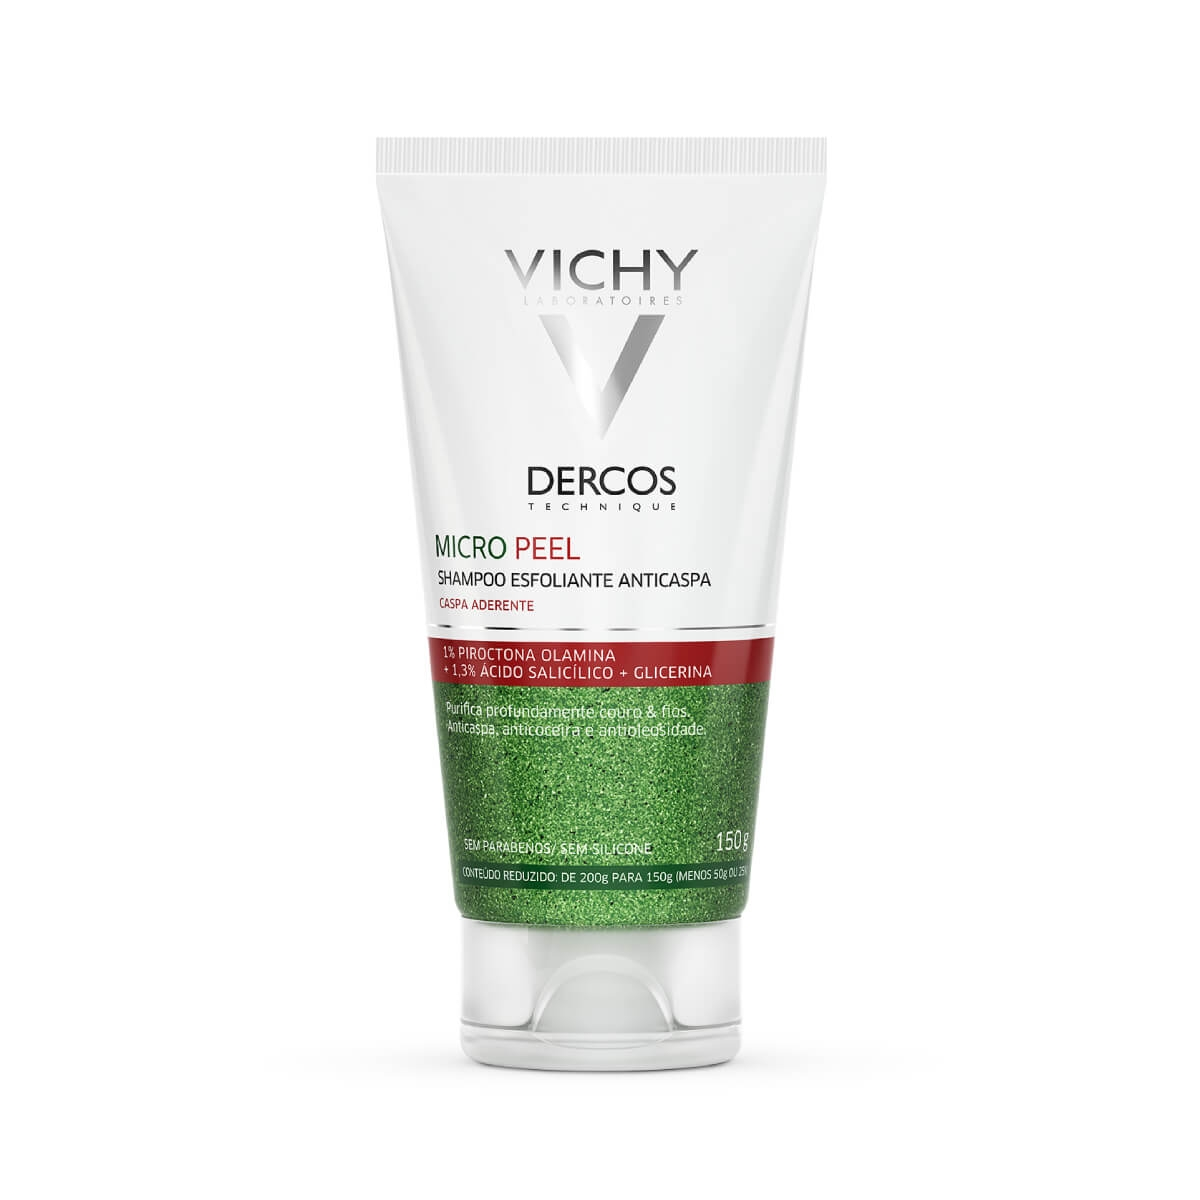 Shampoo Esfoliante Anticaspa Vichy Dercos Micro Peel com 150ml 150ml